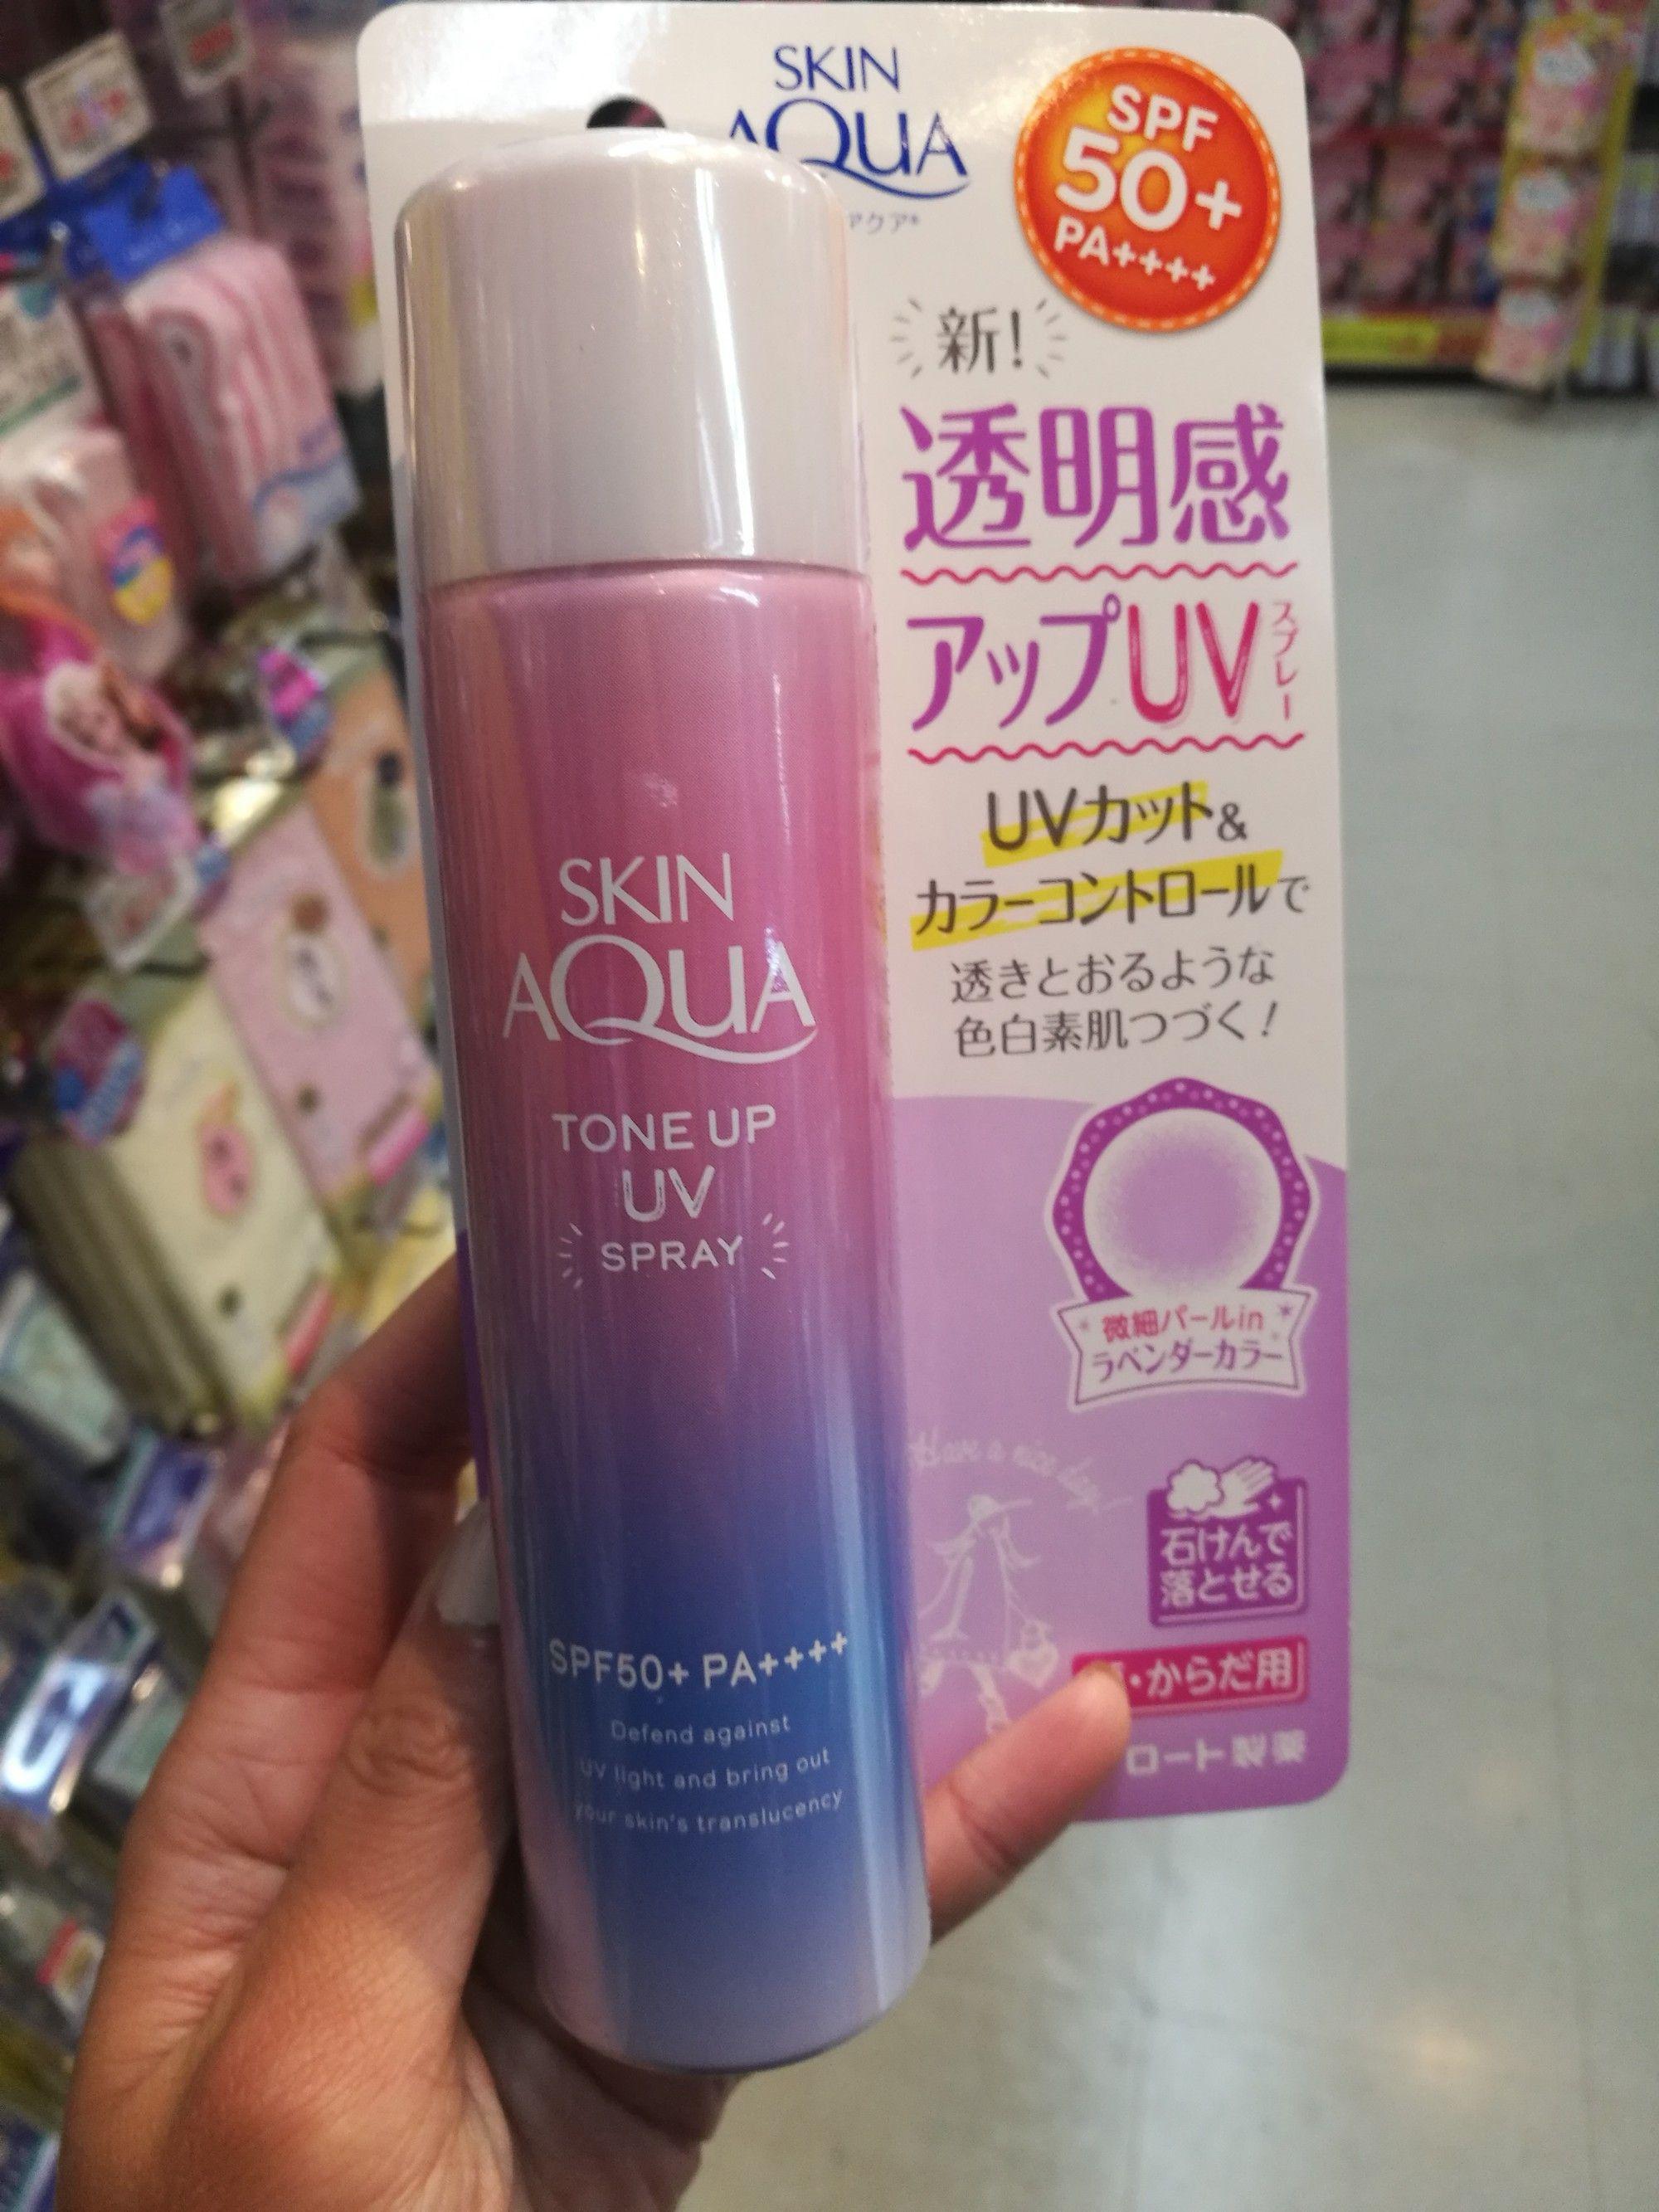 2018 S New Must Buy Japanese Sunscreens Japan Travel Guide Jw Web Magazine Japanese Skincare Sunscreen Skin Care